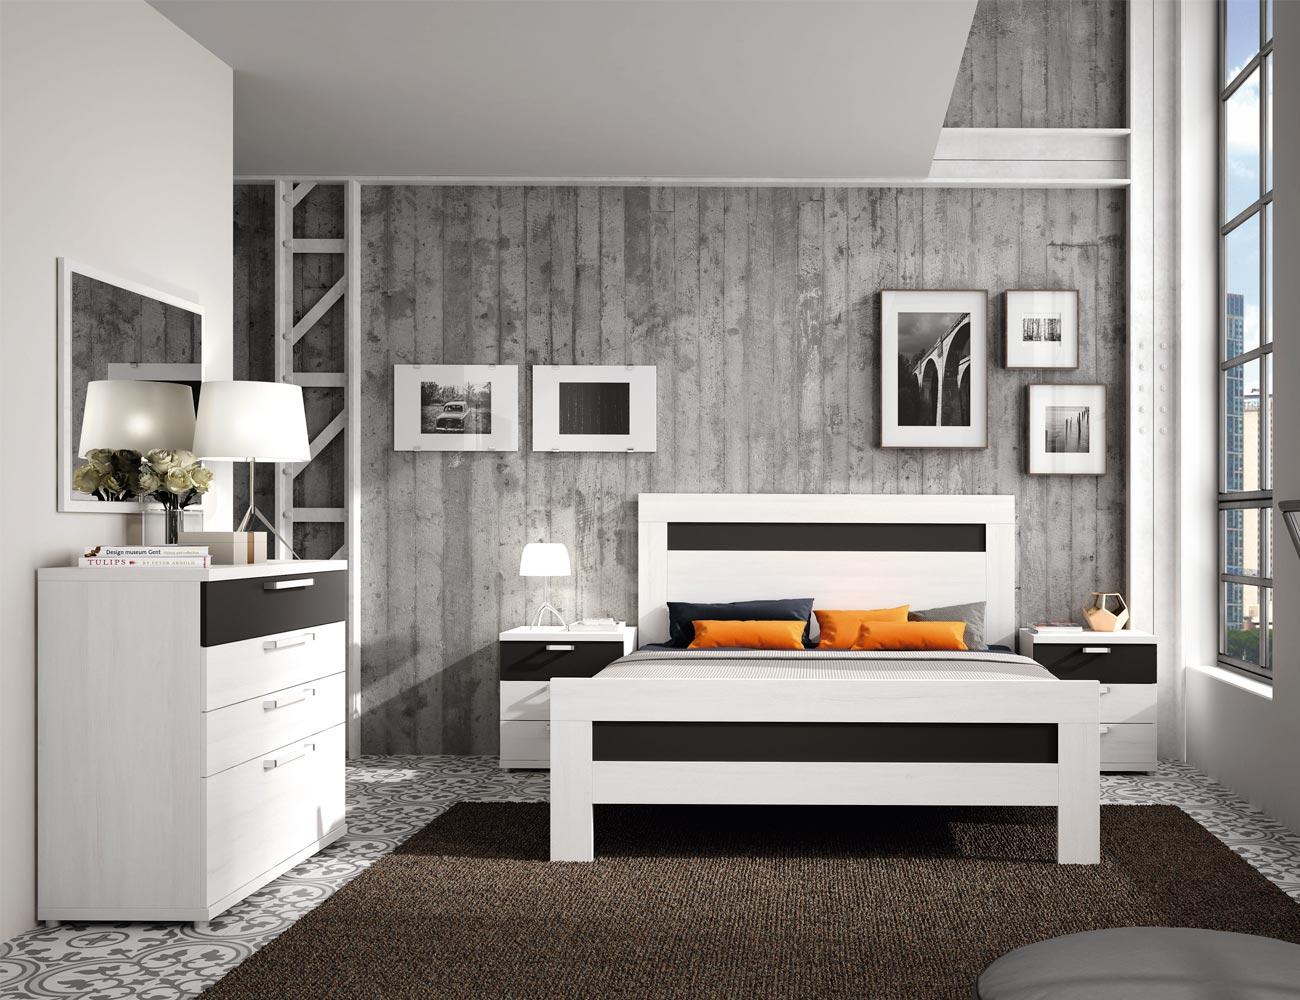 463 dormitorio matrimonio comoda polar antracita